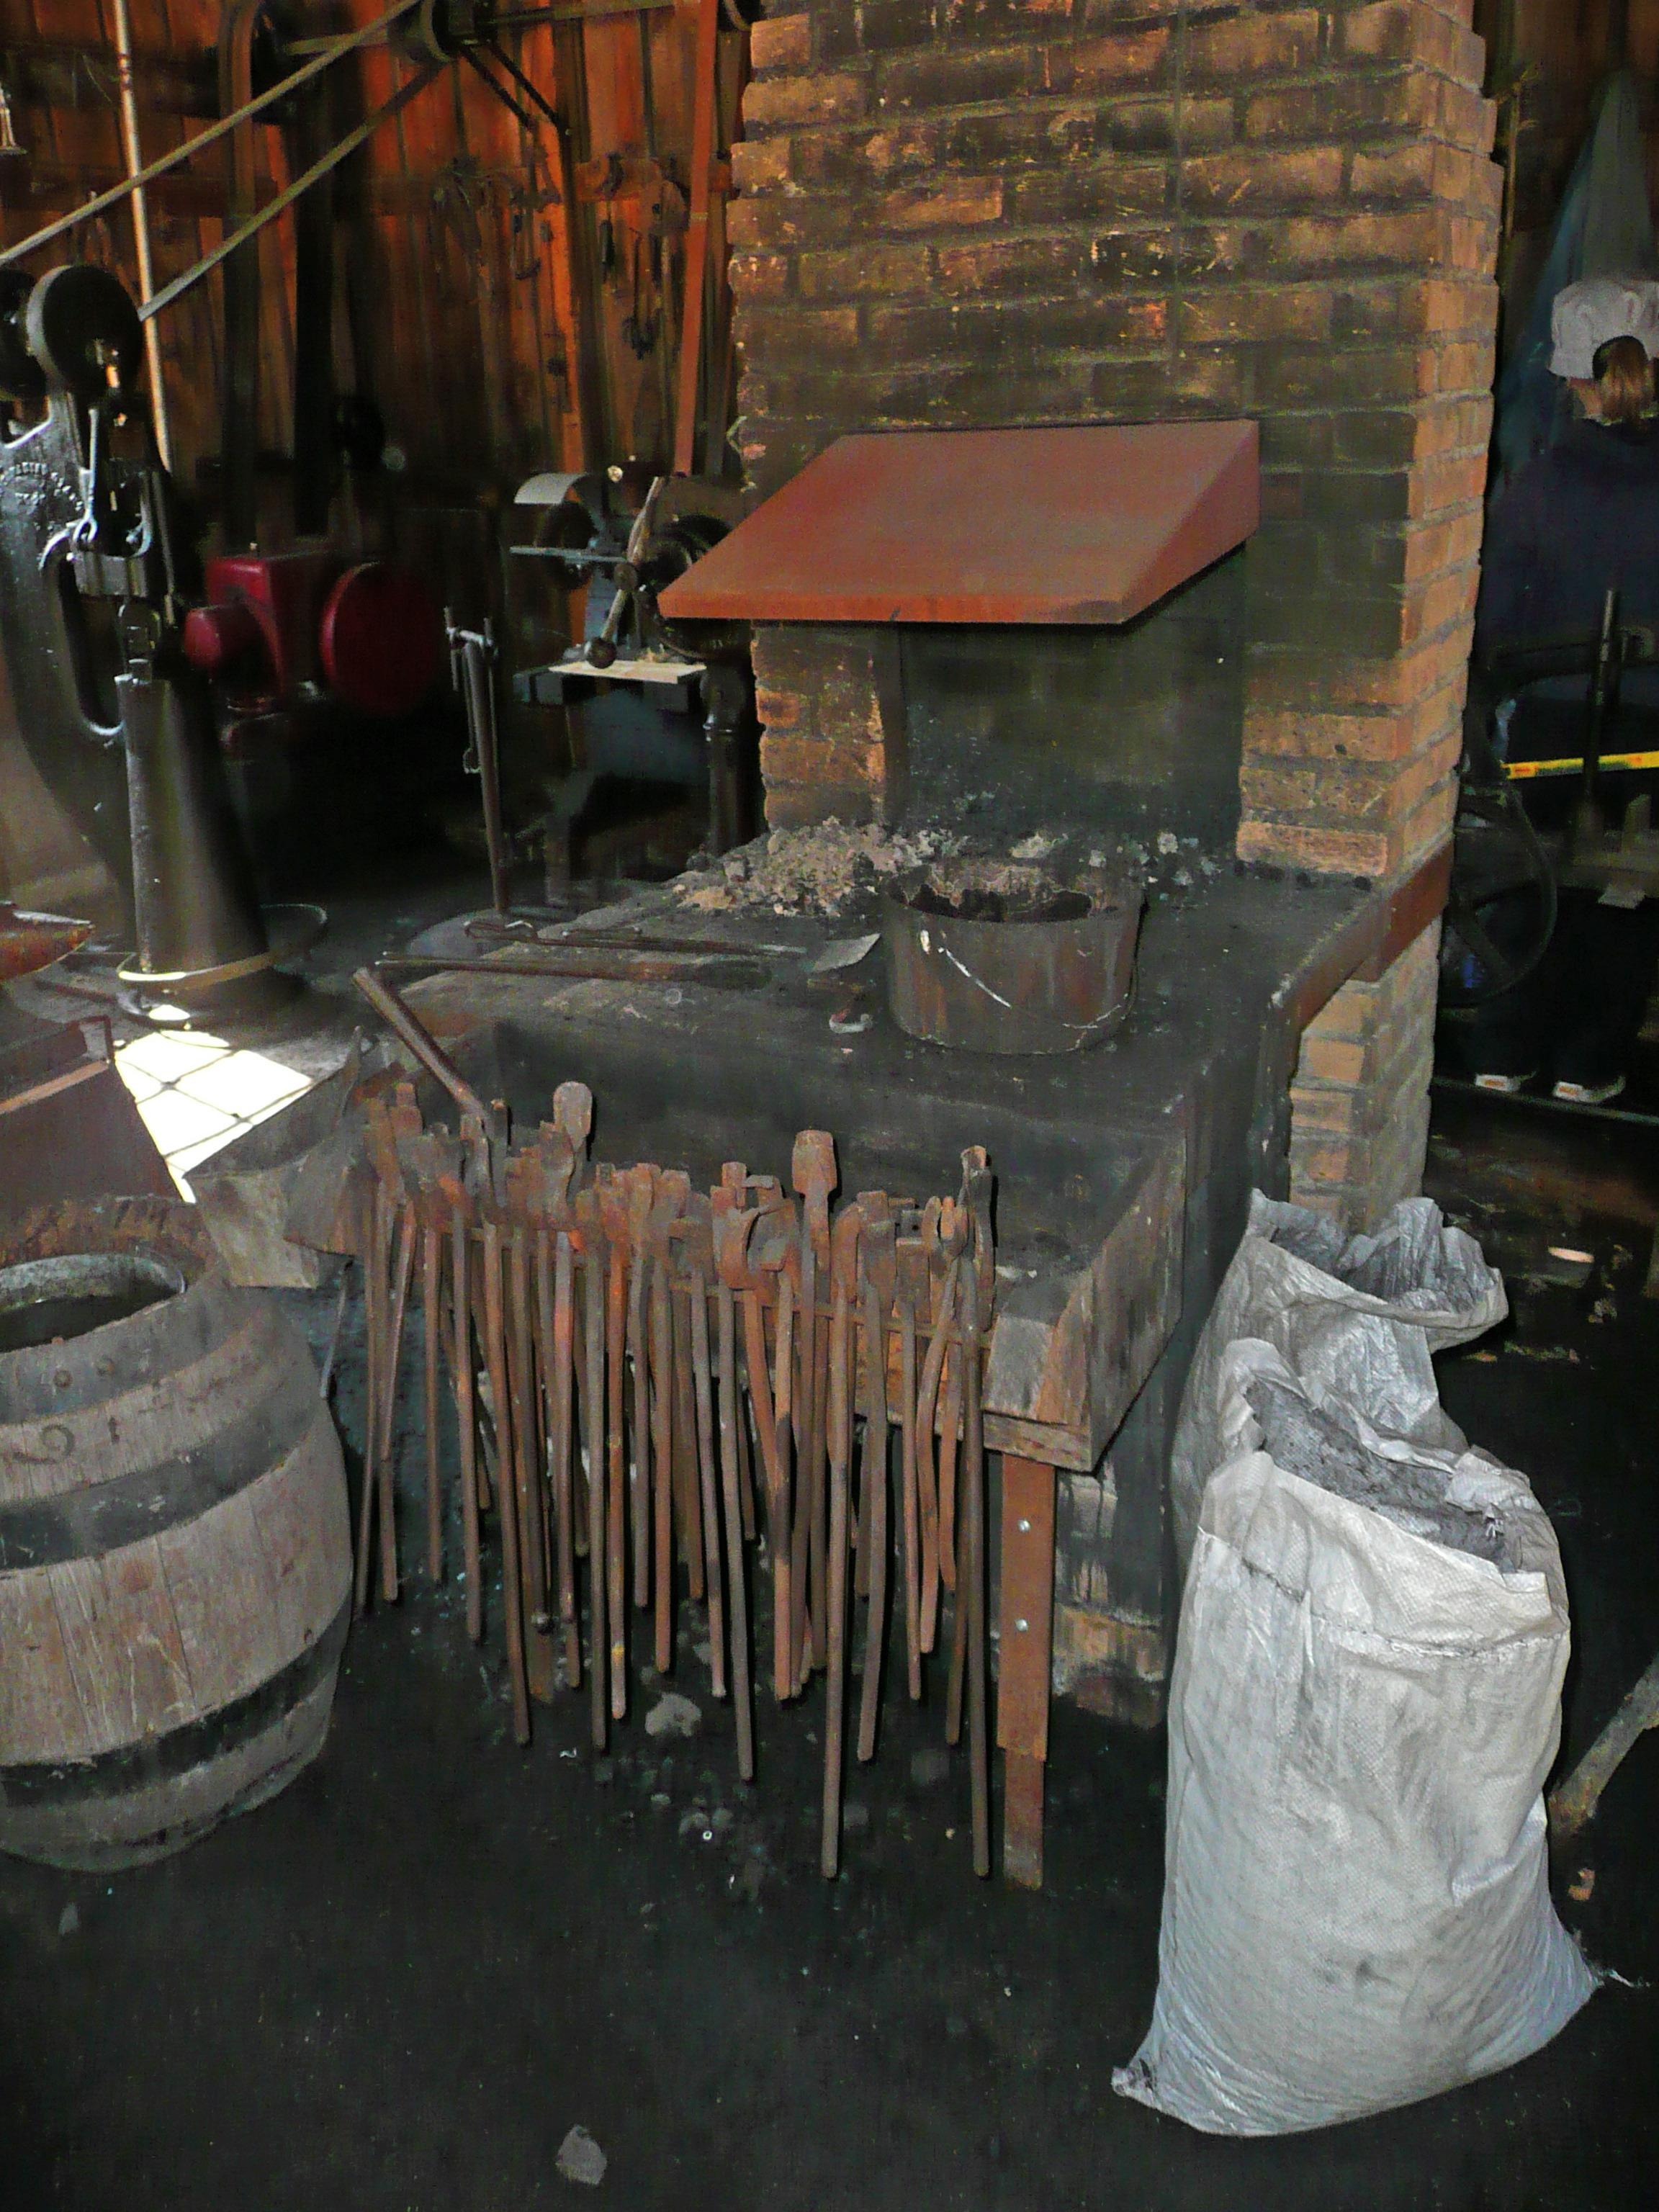 Fotos gratis : madera, antiguo, Canadá, herramientas, fragua ...